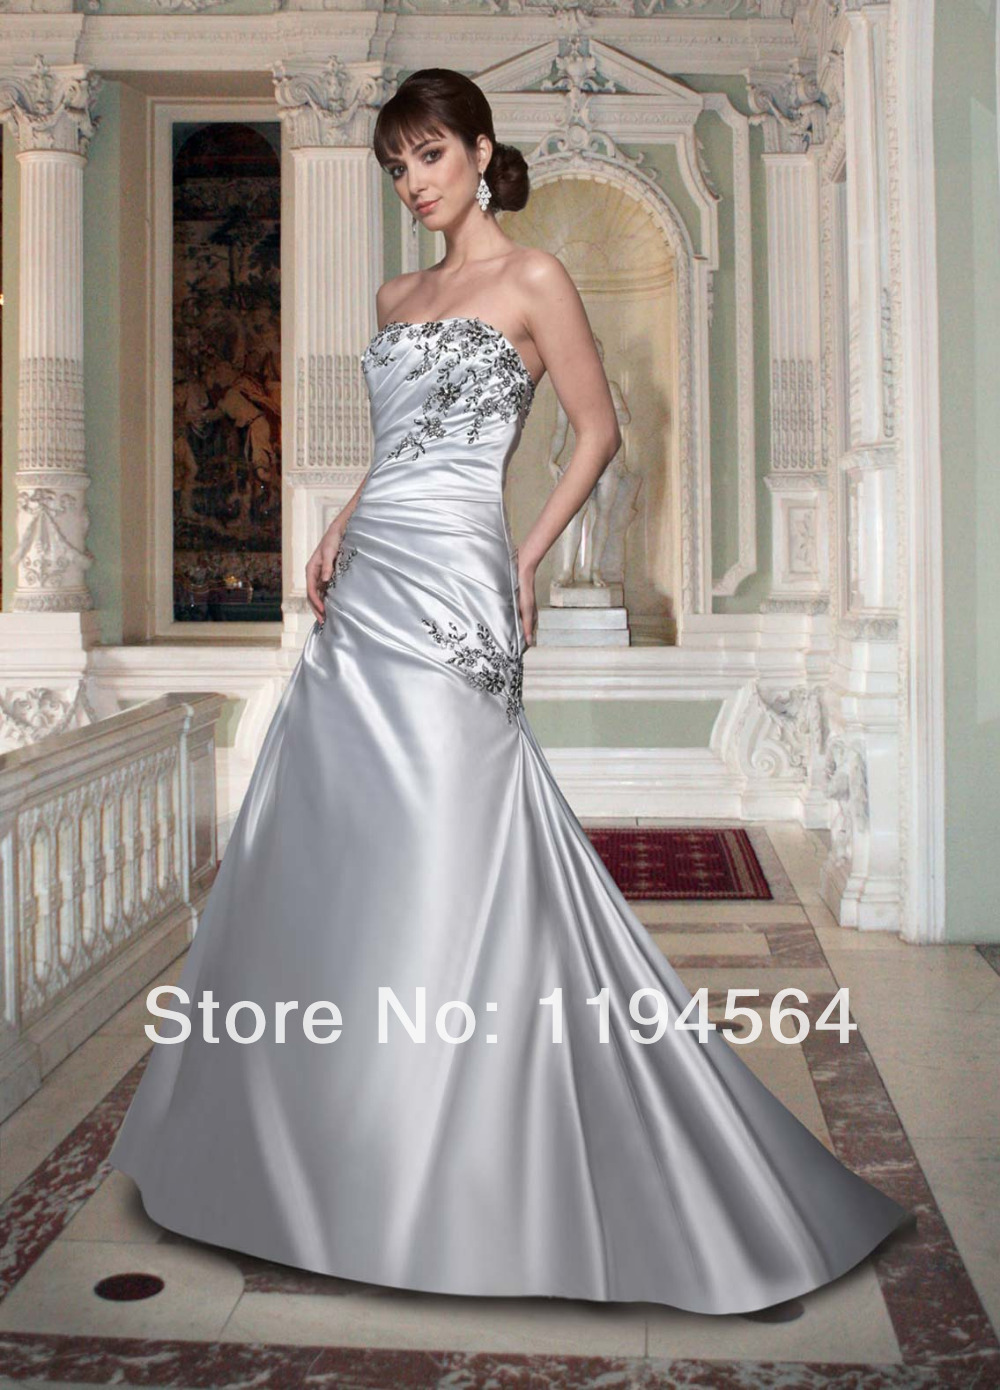 silver dresses for wedding silver wedding dresses Silver dresses for wedding